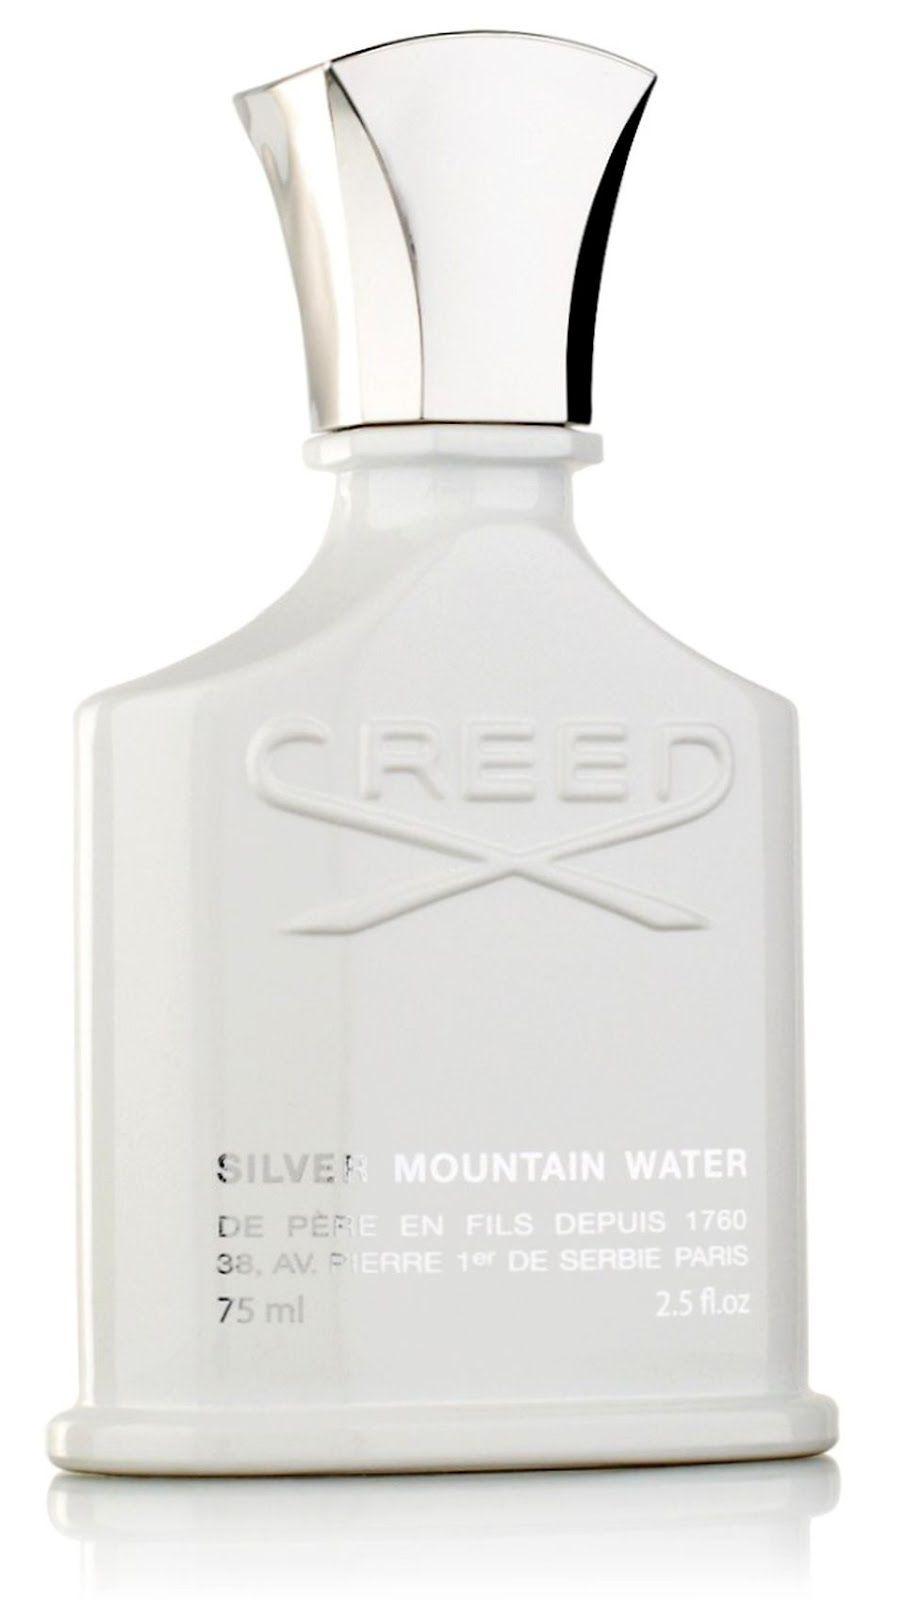 Creed Creed Silver Mountain Water Cologne 4 0 Oz Eau De Parfum Spray For Men French Fragrance Unique Fragrance Eau De Parfum